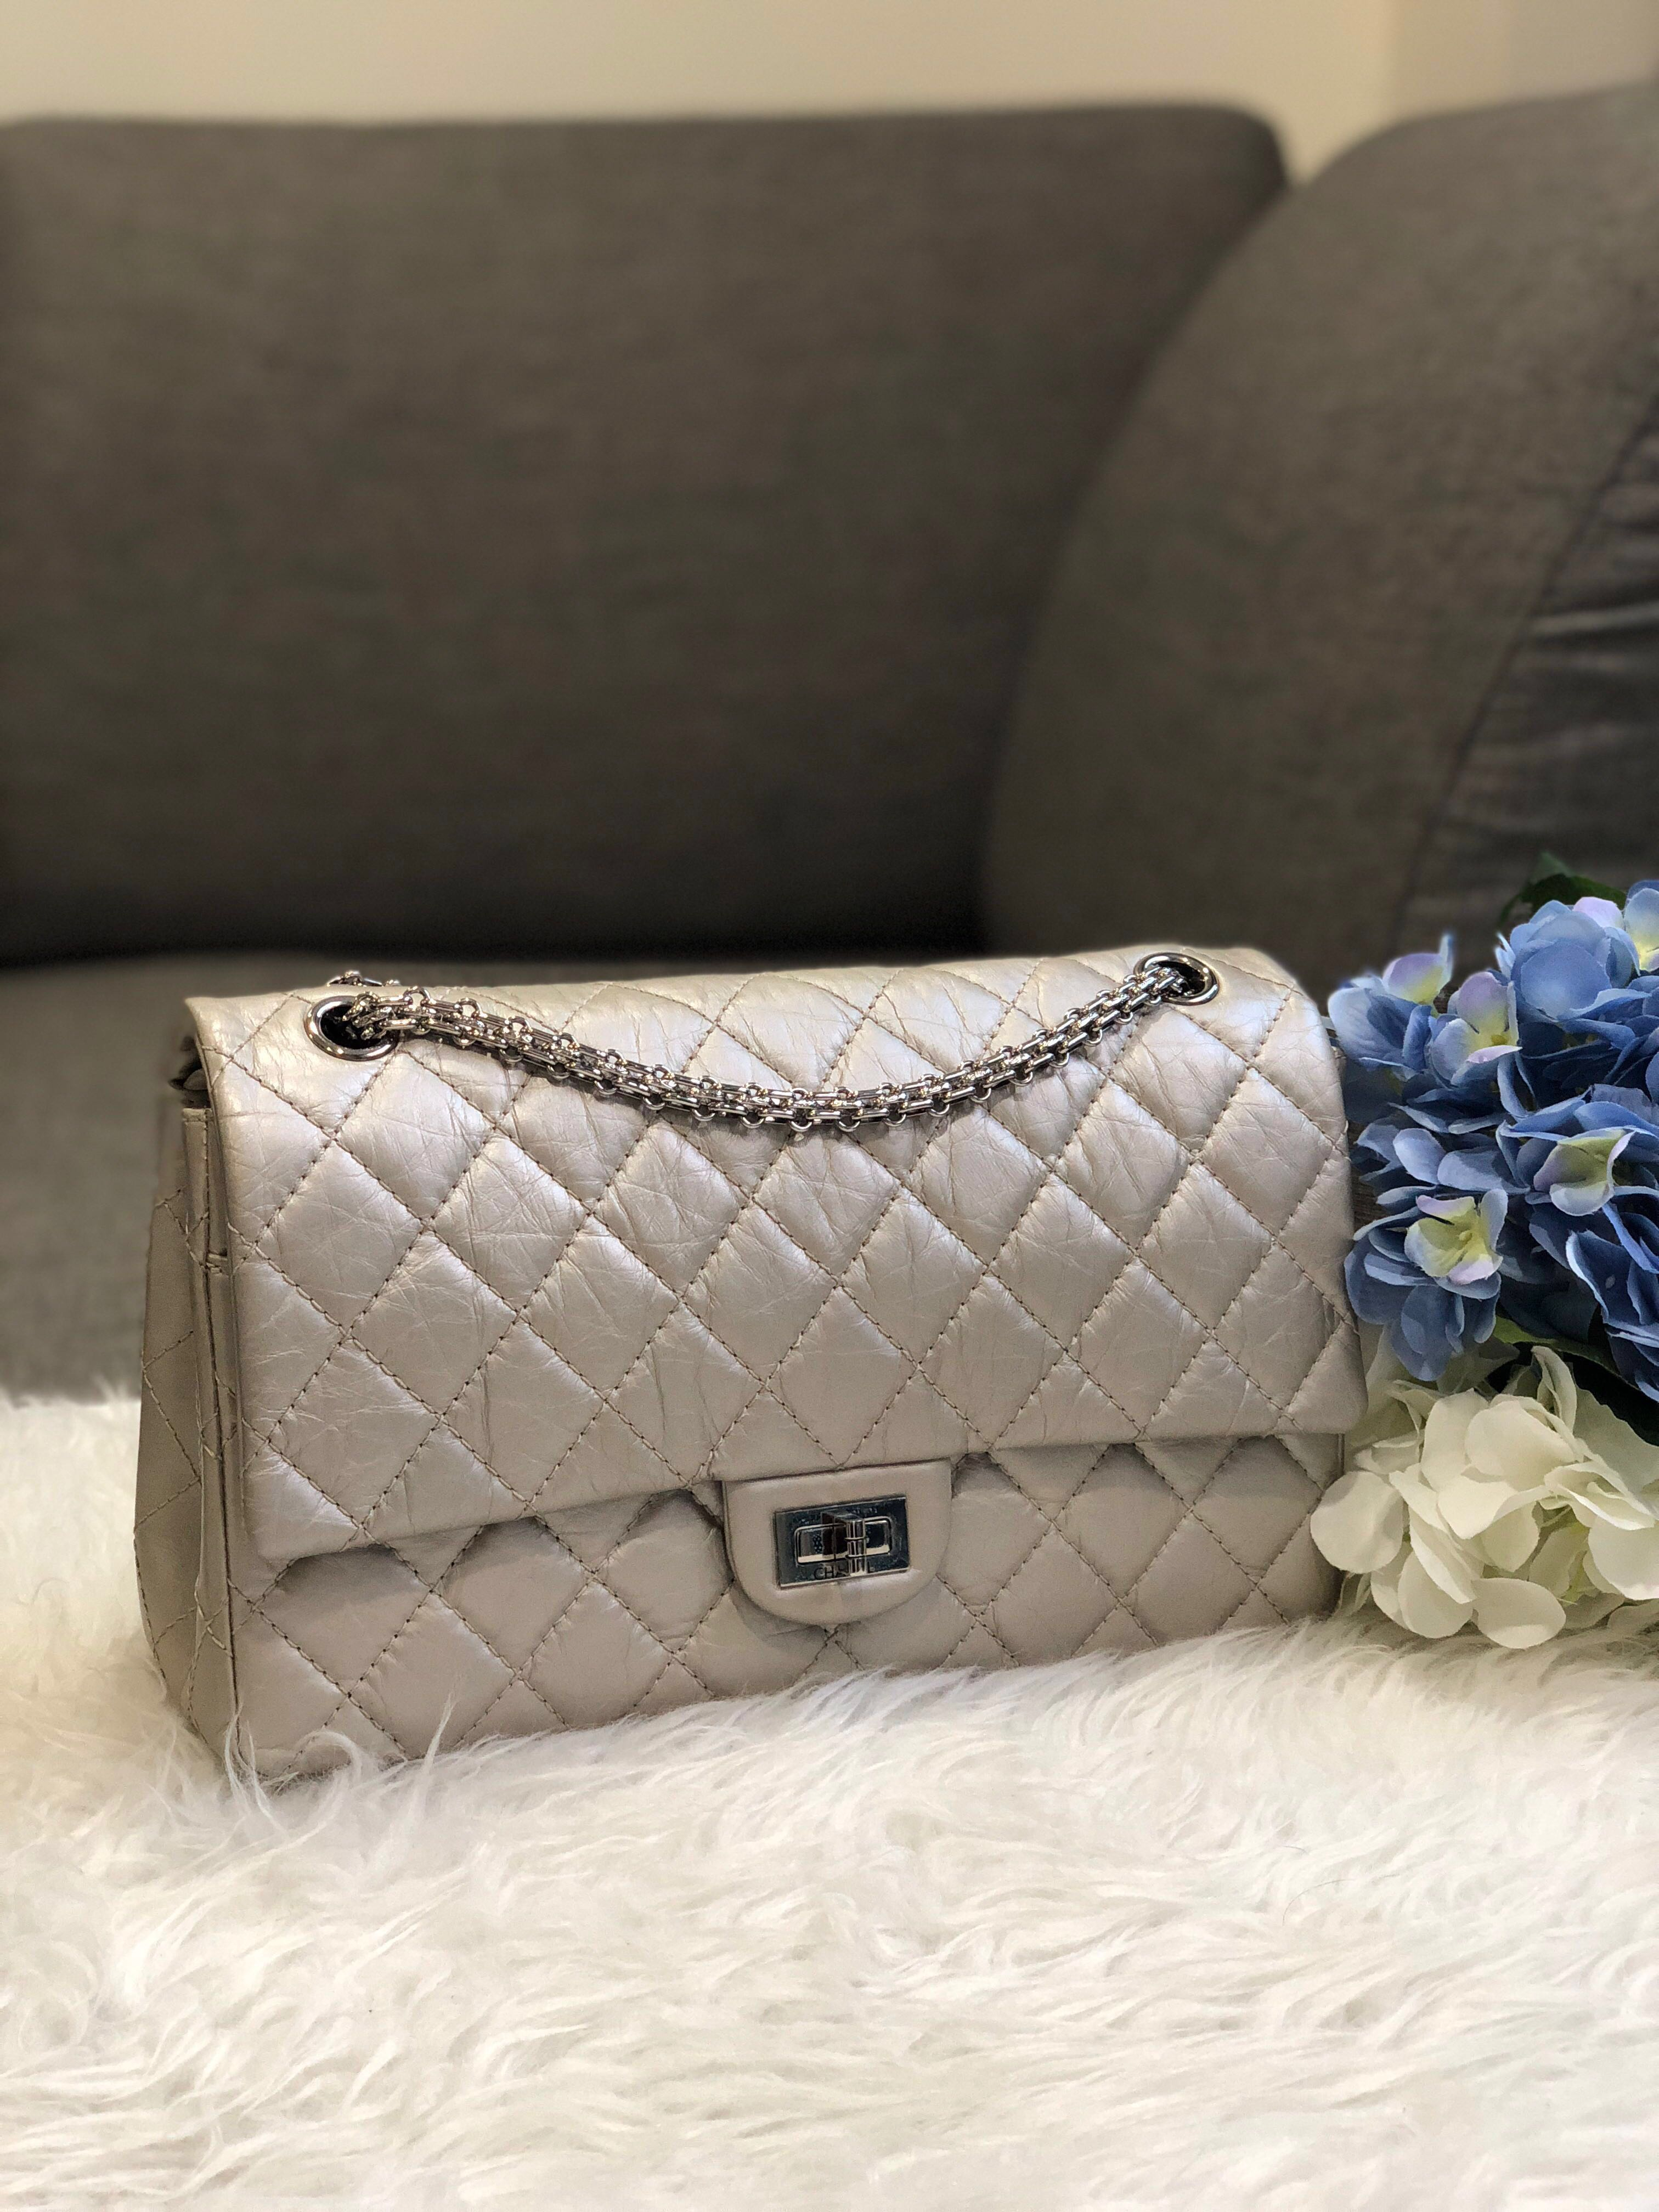 86773611a0448c Chanel 2.55 Reissue 226 Flap in Silver Metallic Distressed Calfskin SHW,  Luxury, Bags & Wallets, Handbags on Carousell